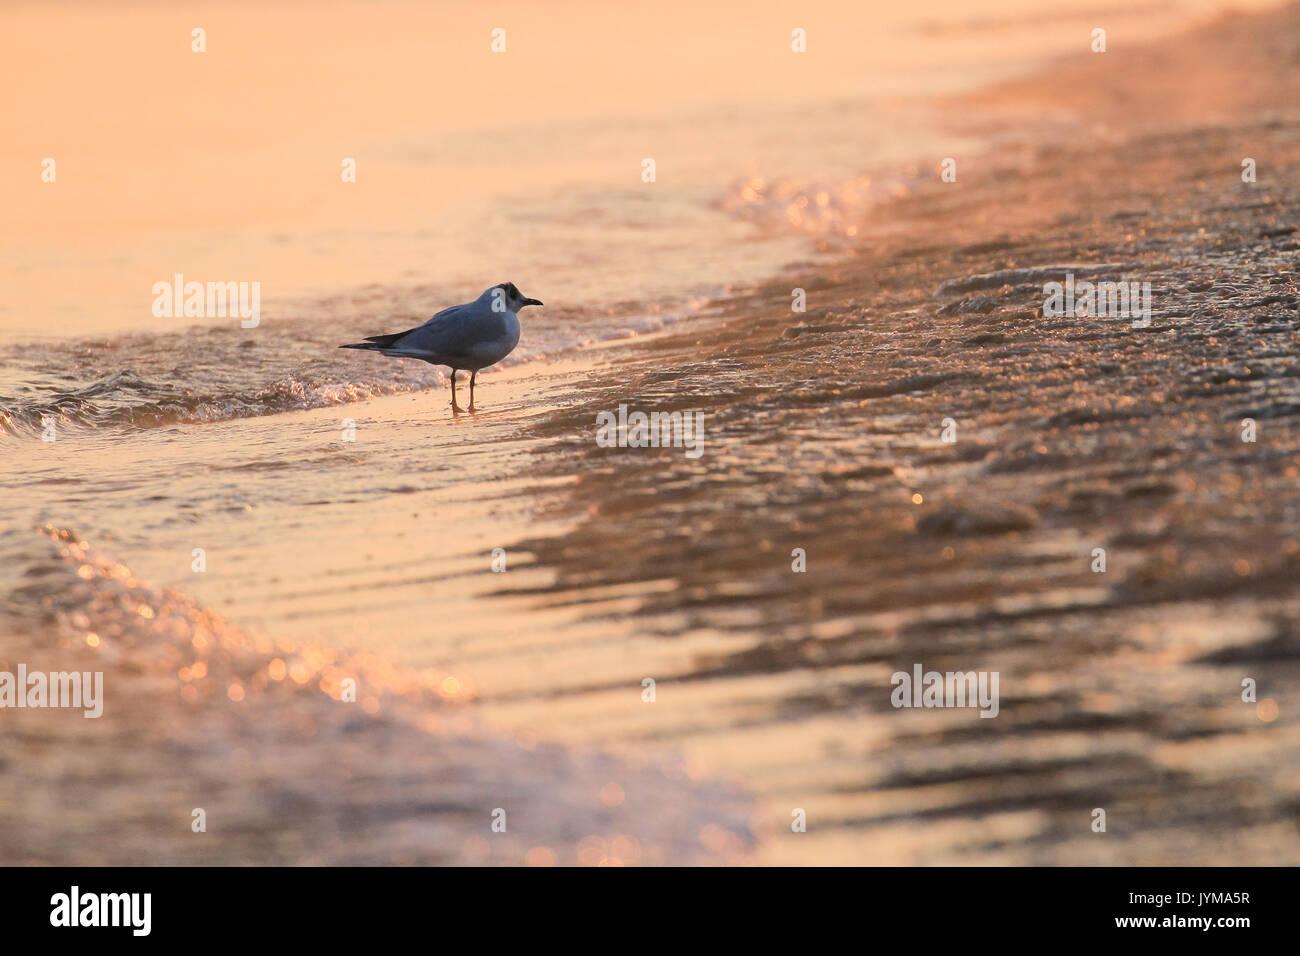 Sea gull adult